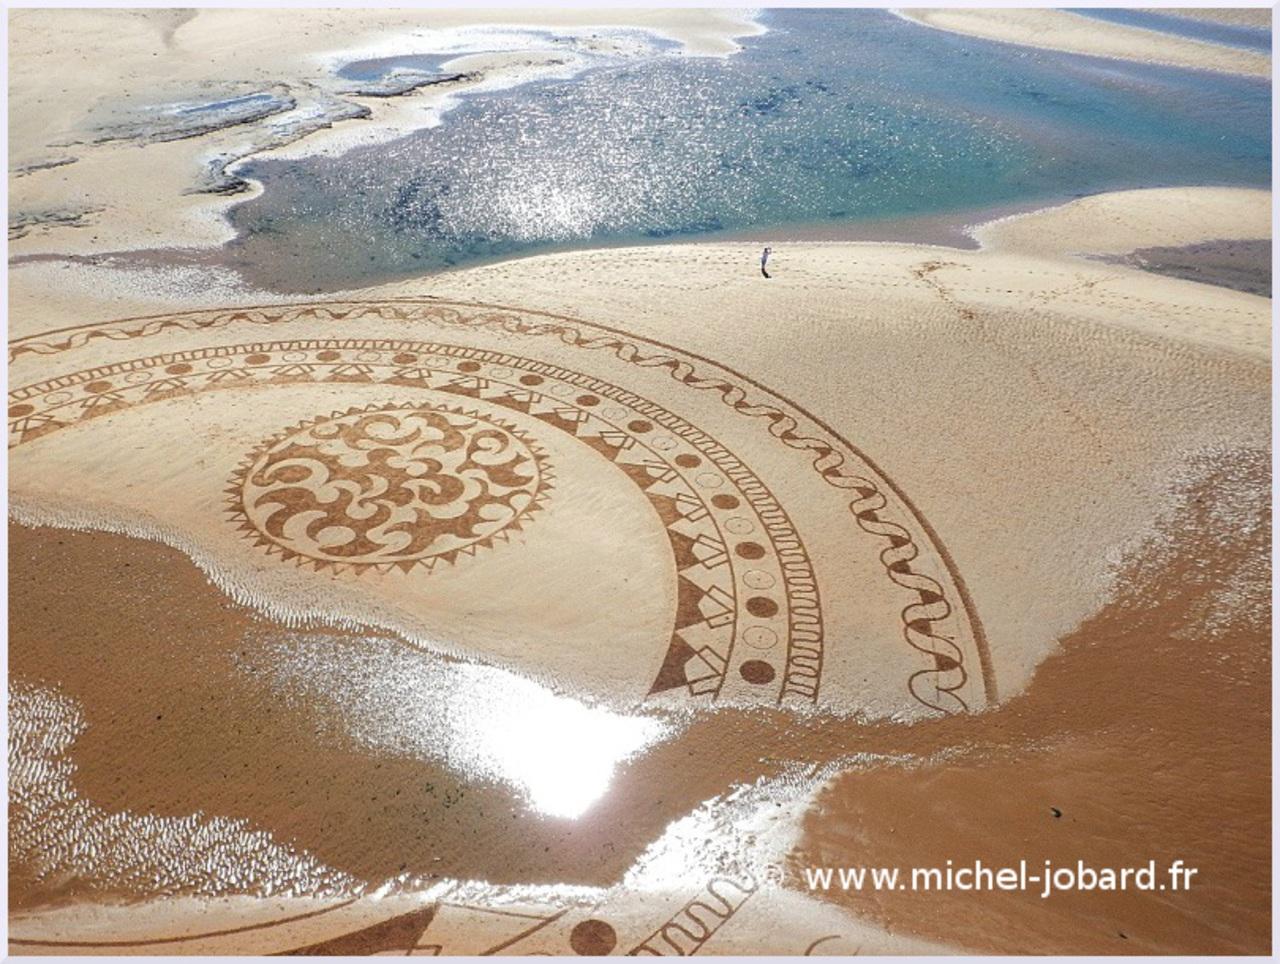 Fresque Beach art Mandala Blue, Michel Jobard